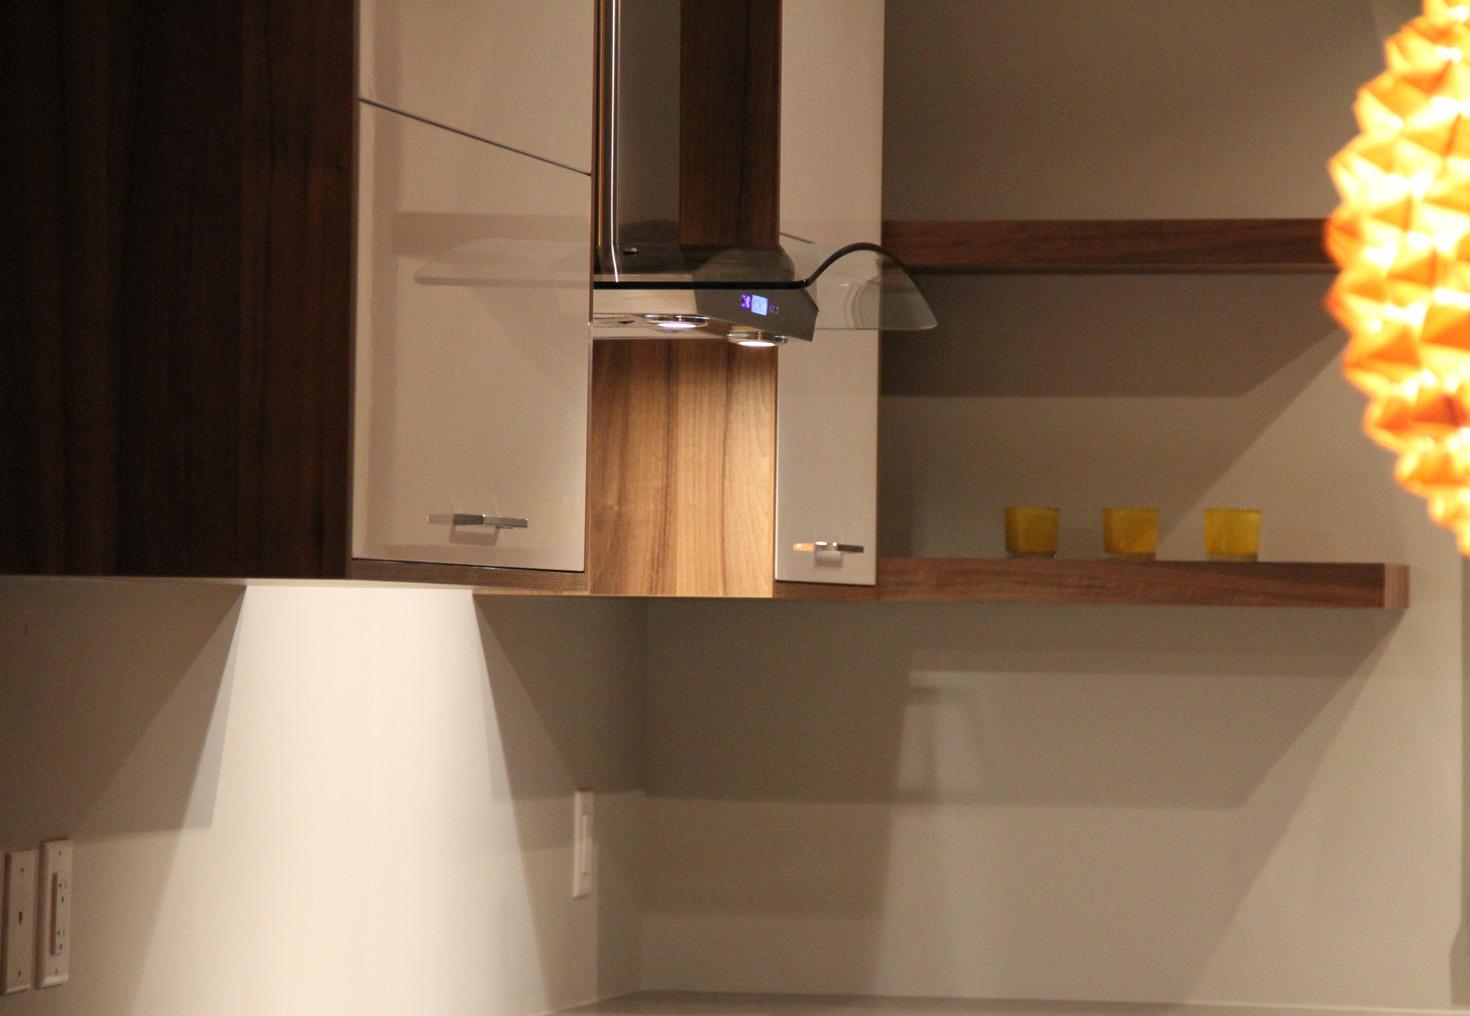 Thermoplastique for Armoire de cuisine thermoplastique prix